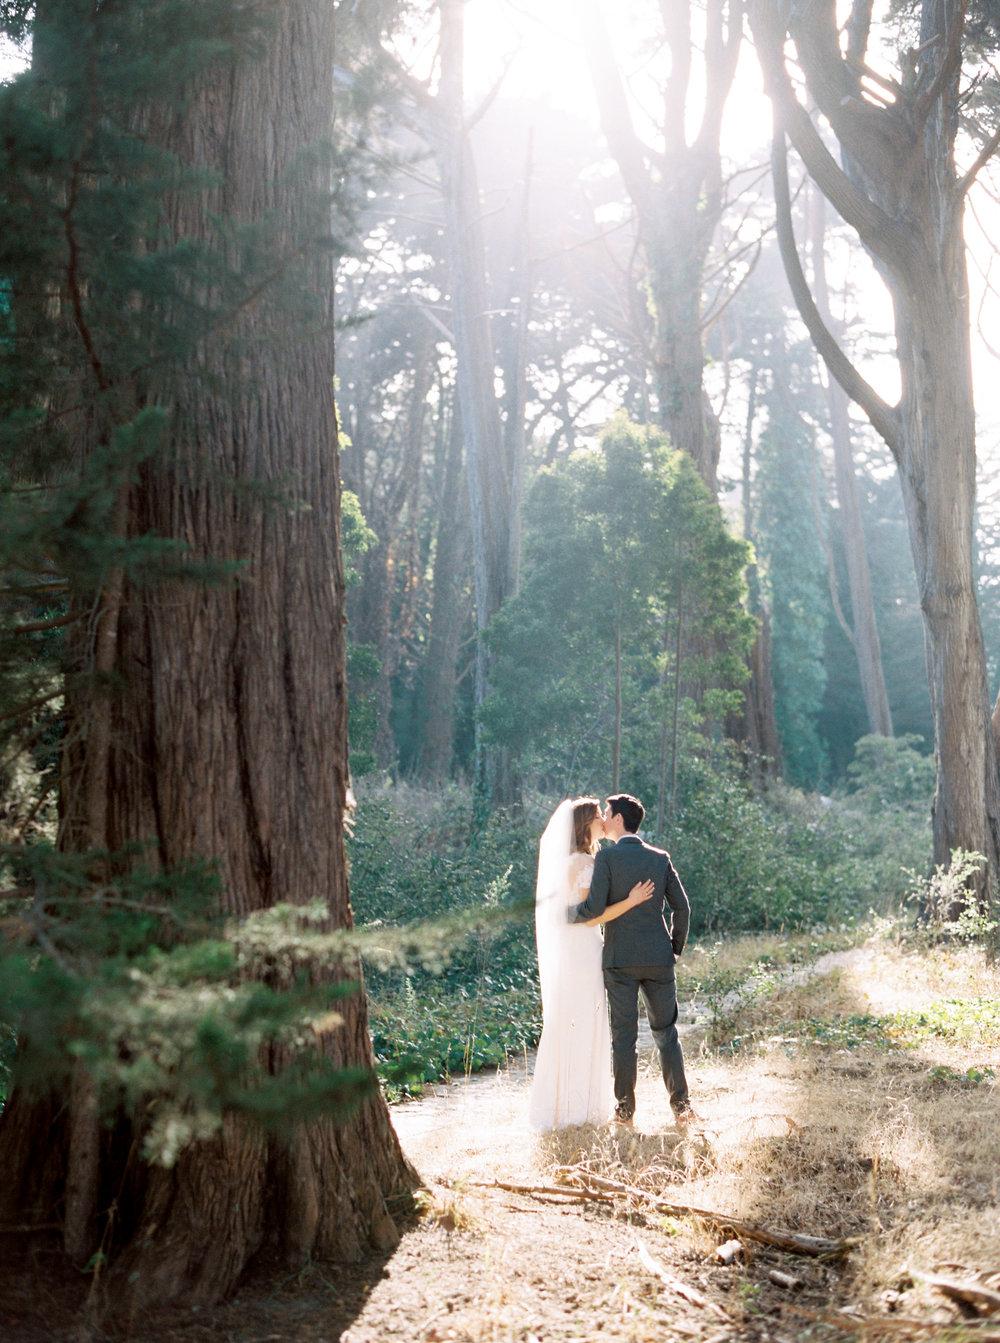 Log-cabin-wedding-in-presidio-san-francisco-california-desintation-wedding-photography-49.jpg